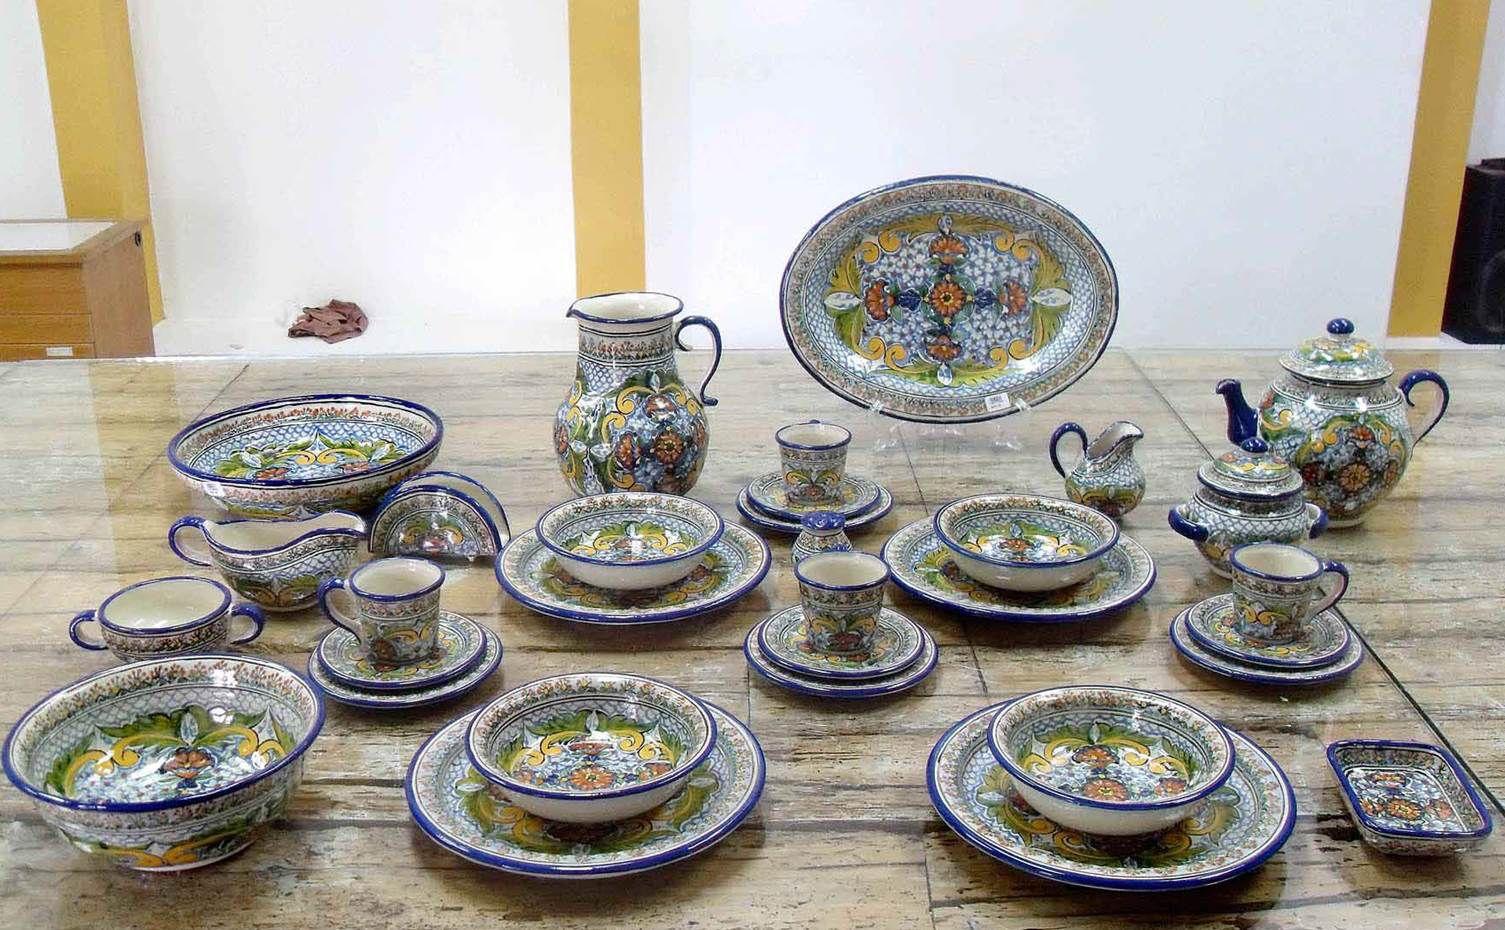 Talavera ceramic birdbaths eclectic bird baths phoenix by - Imagen De Http Hechoenmexicob2b Com Uploadedimages B70bc36f50bd246e7c3acd94b968594d Jpg